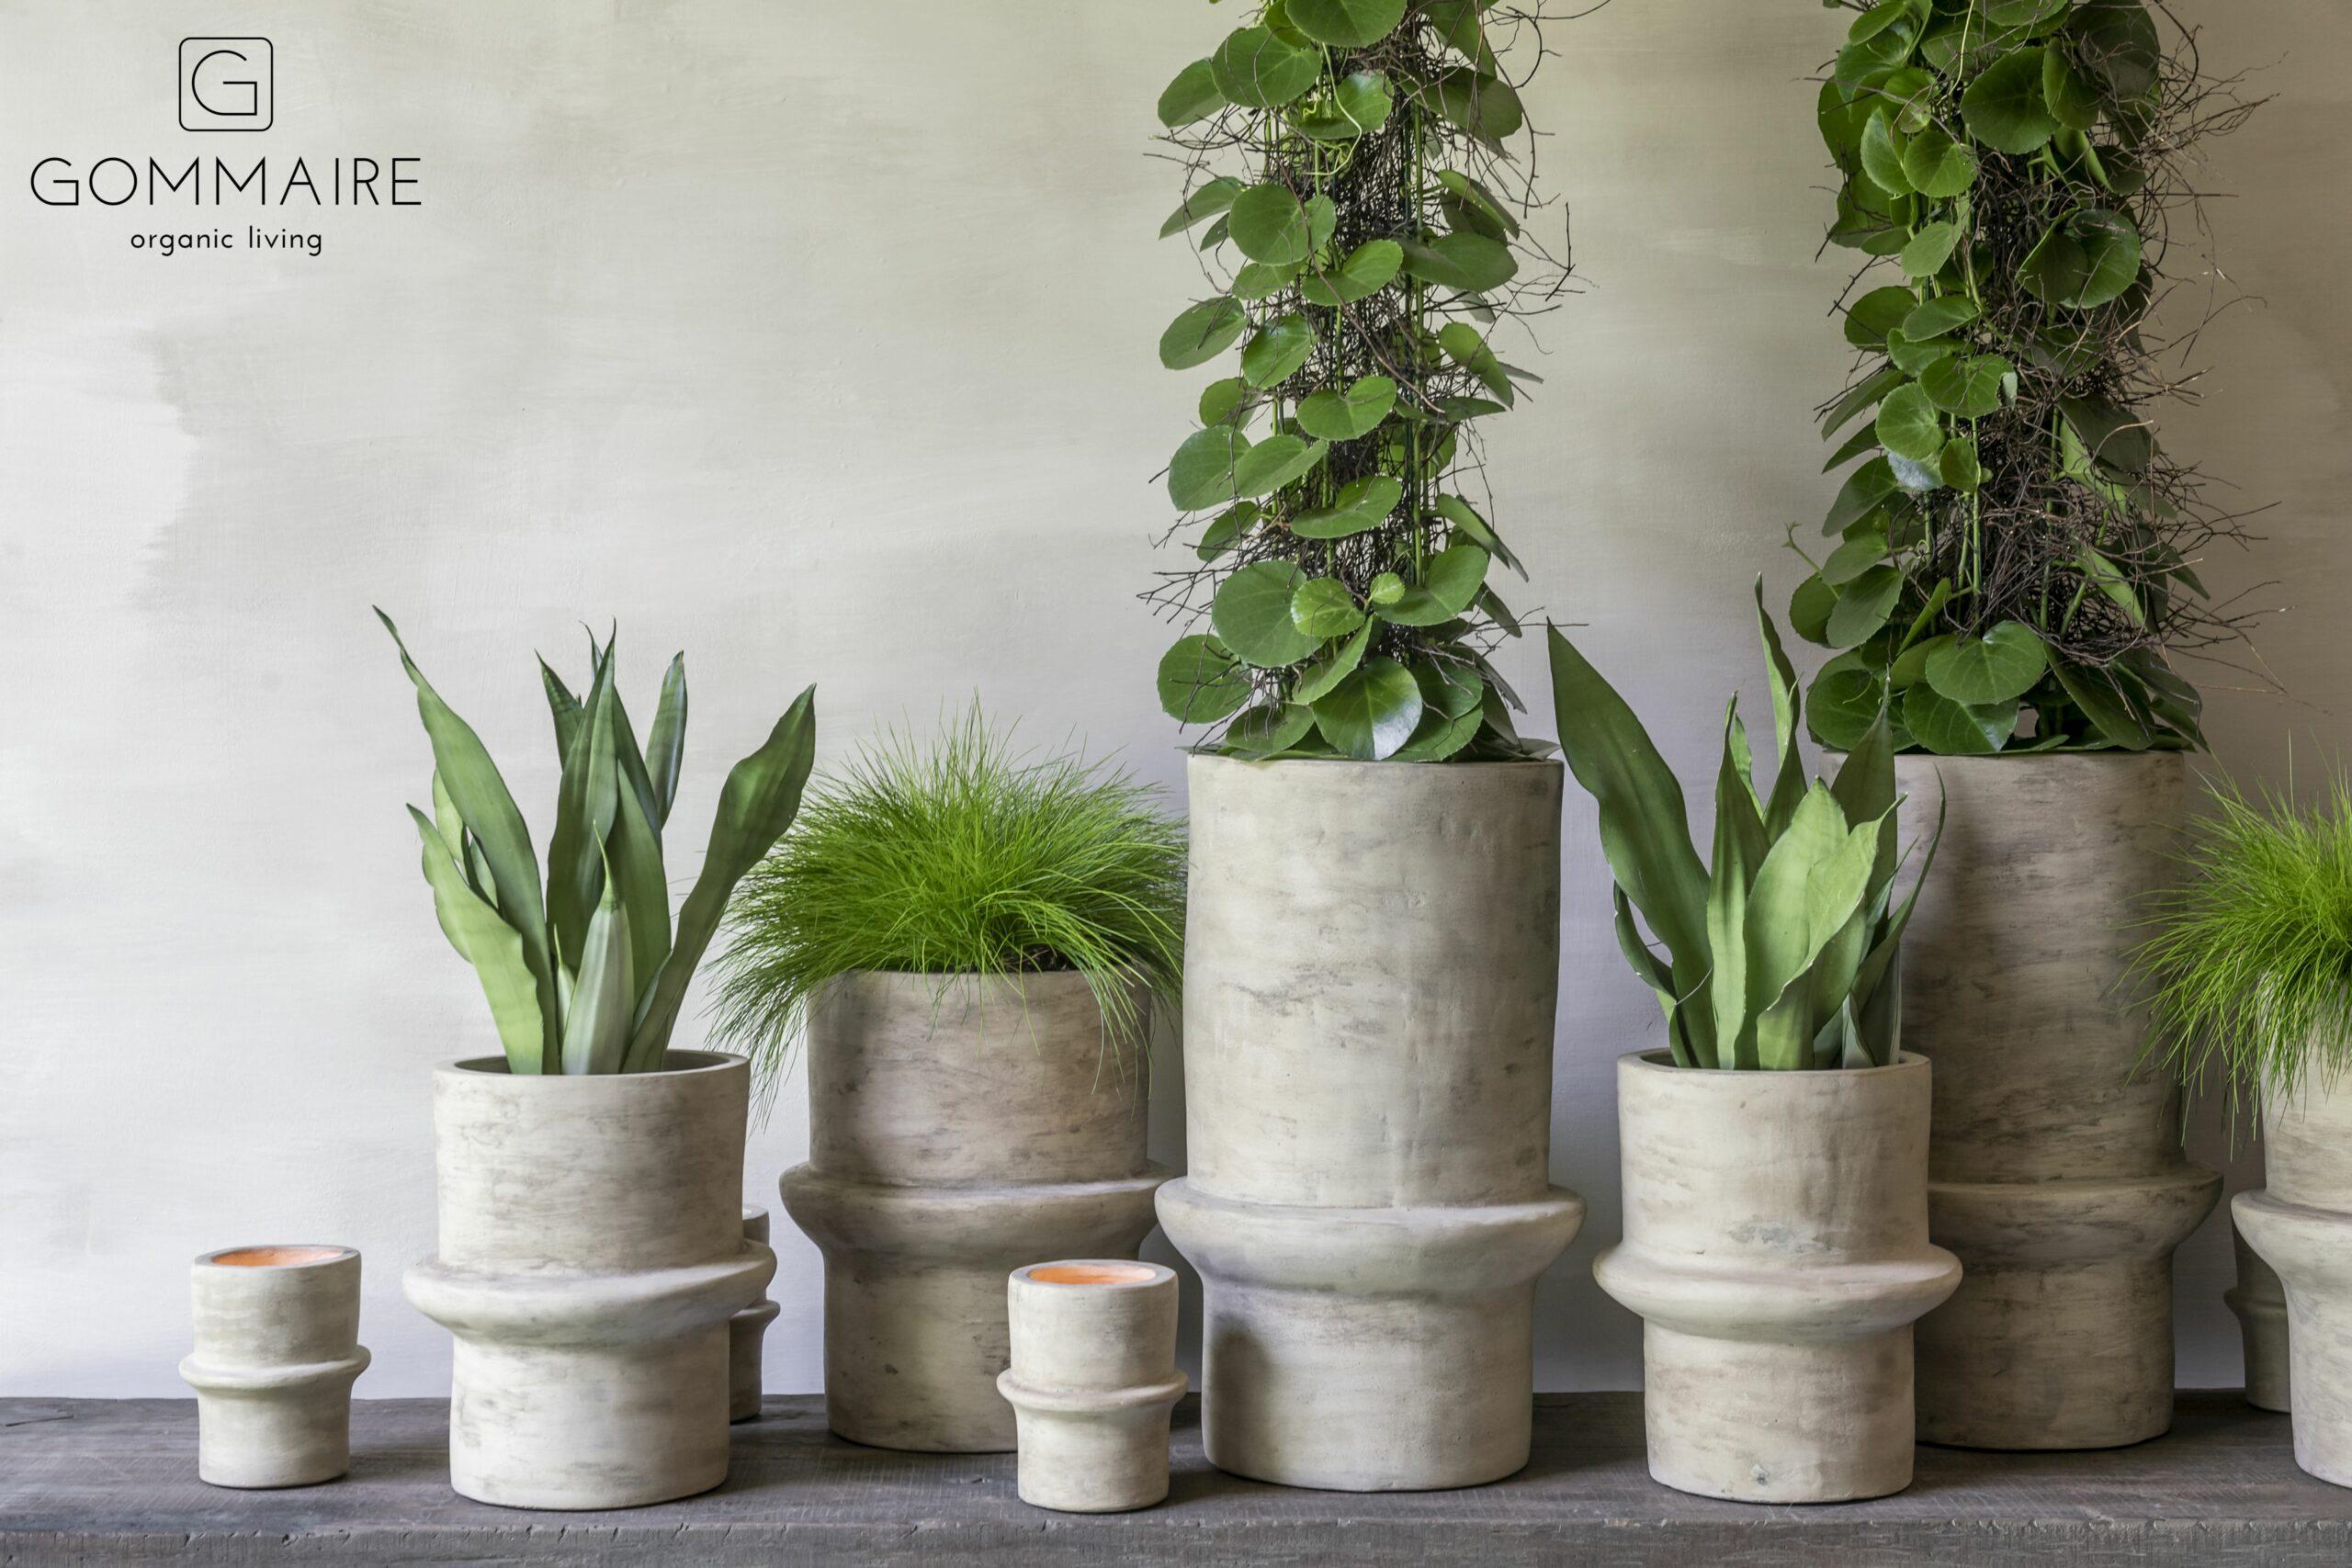 Gommaire-decoration-terracotta-accessories-vase_gabriel